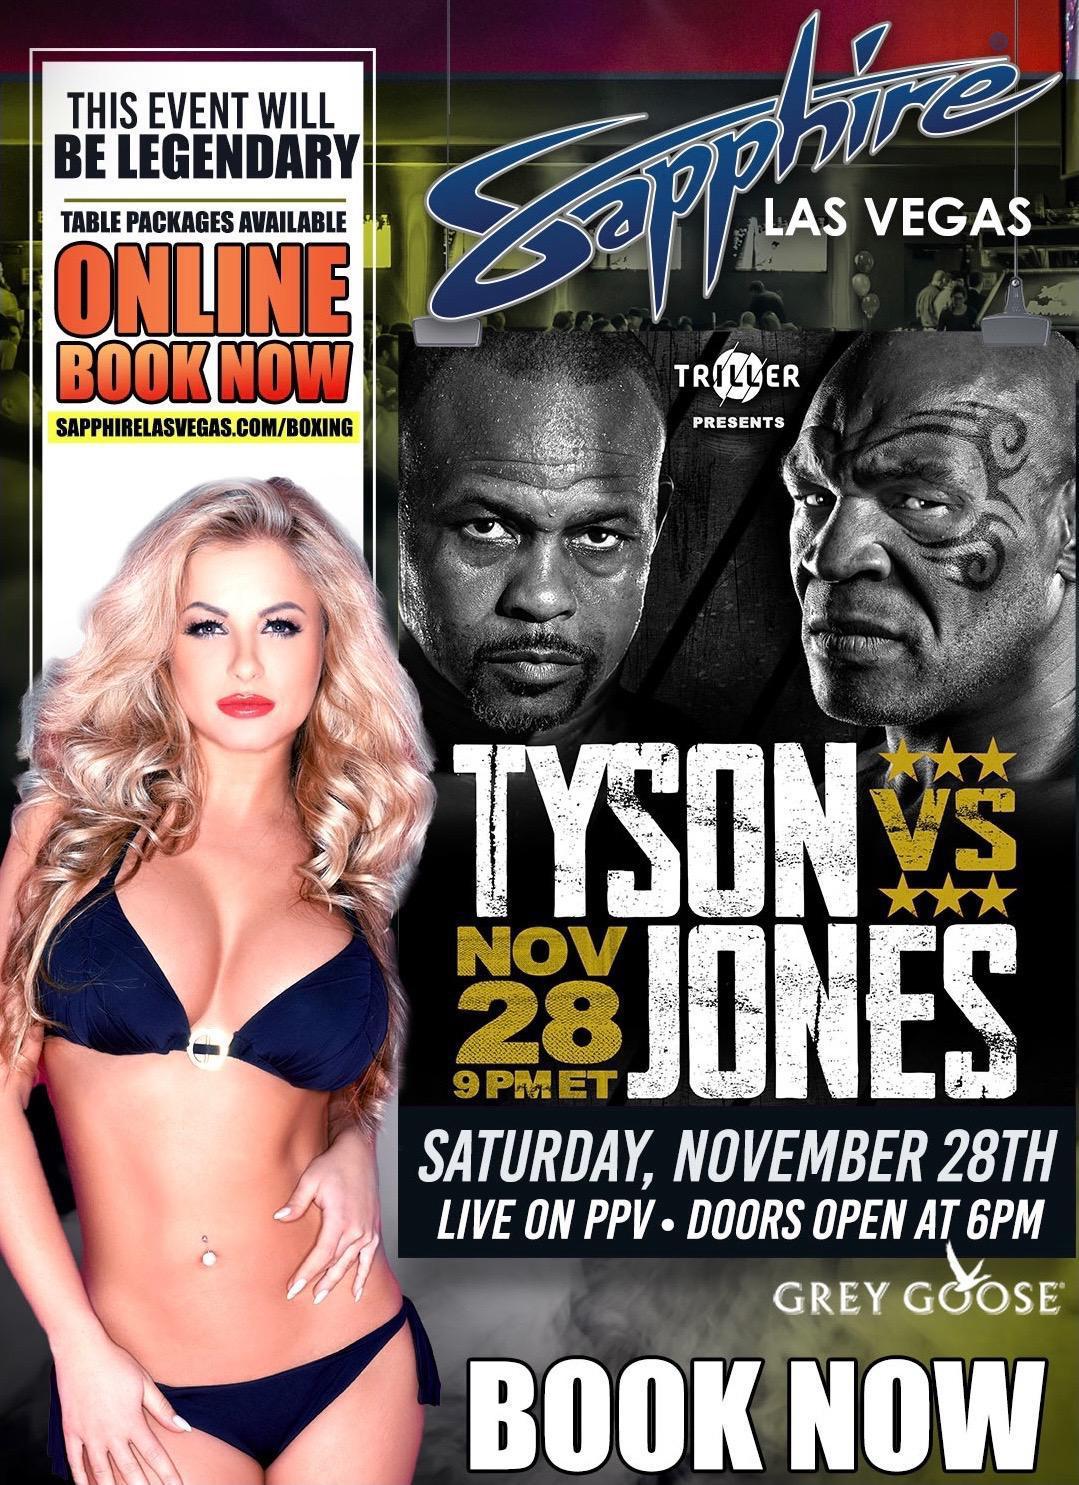 It's FIGHT NIGHT - Iron Mike is BACK! Watch Tyson vs Jones Live on PPV TONIGHT at Sapphire Las Vegas. Doors open at 6pm.